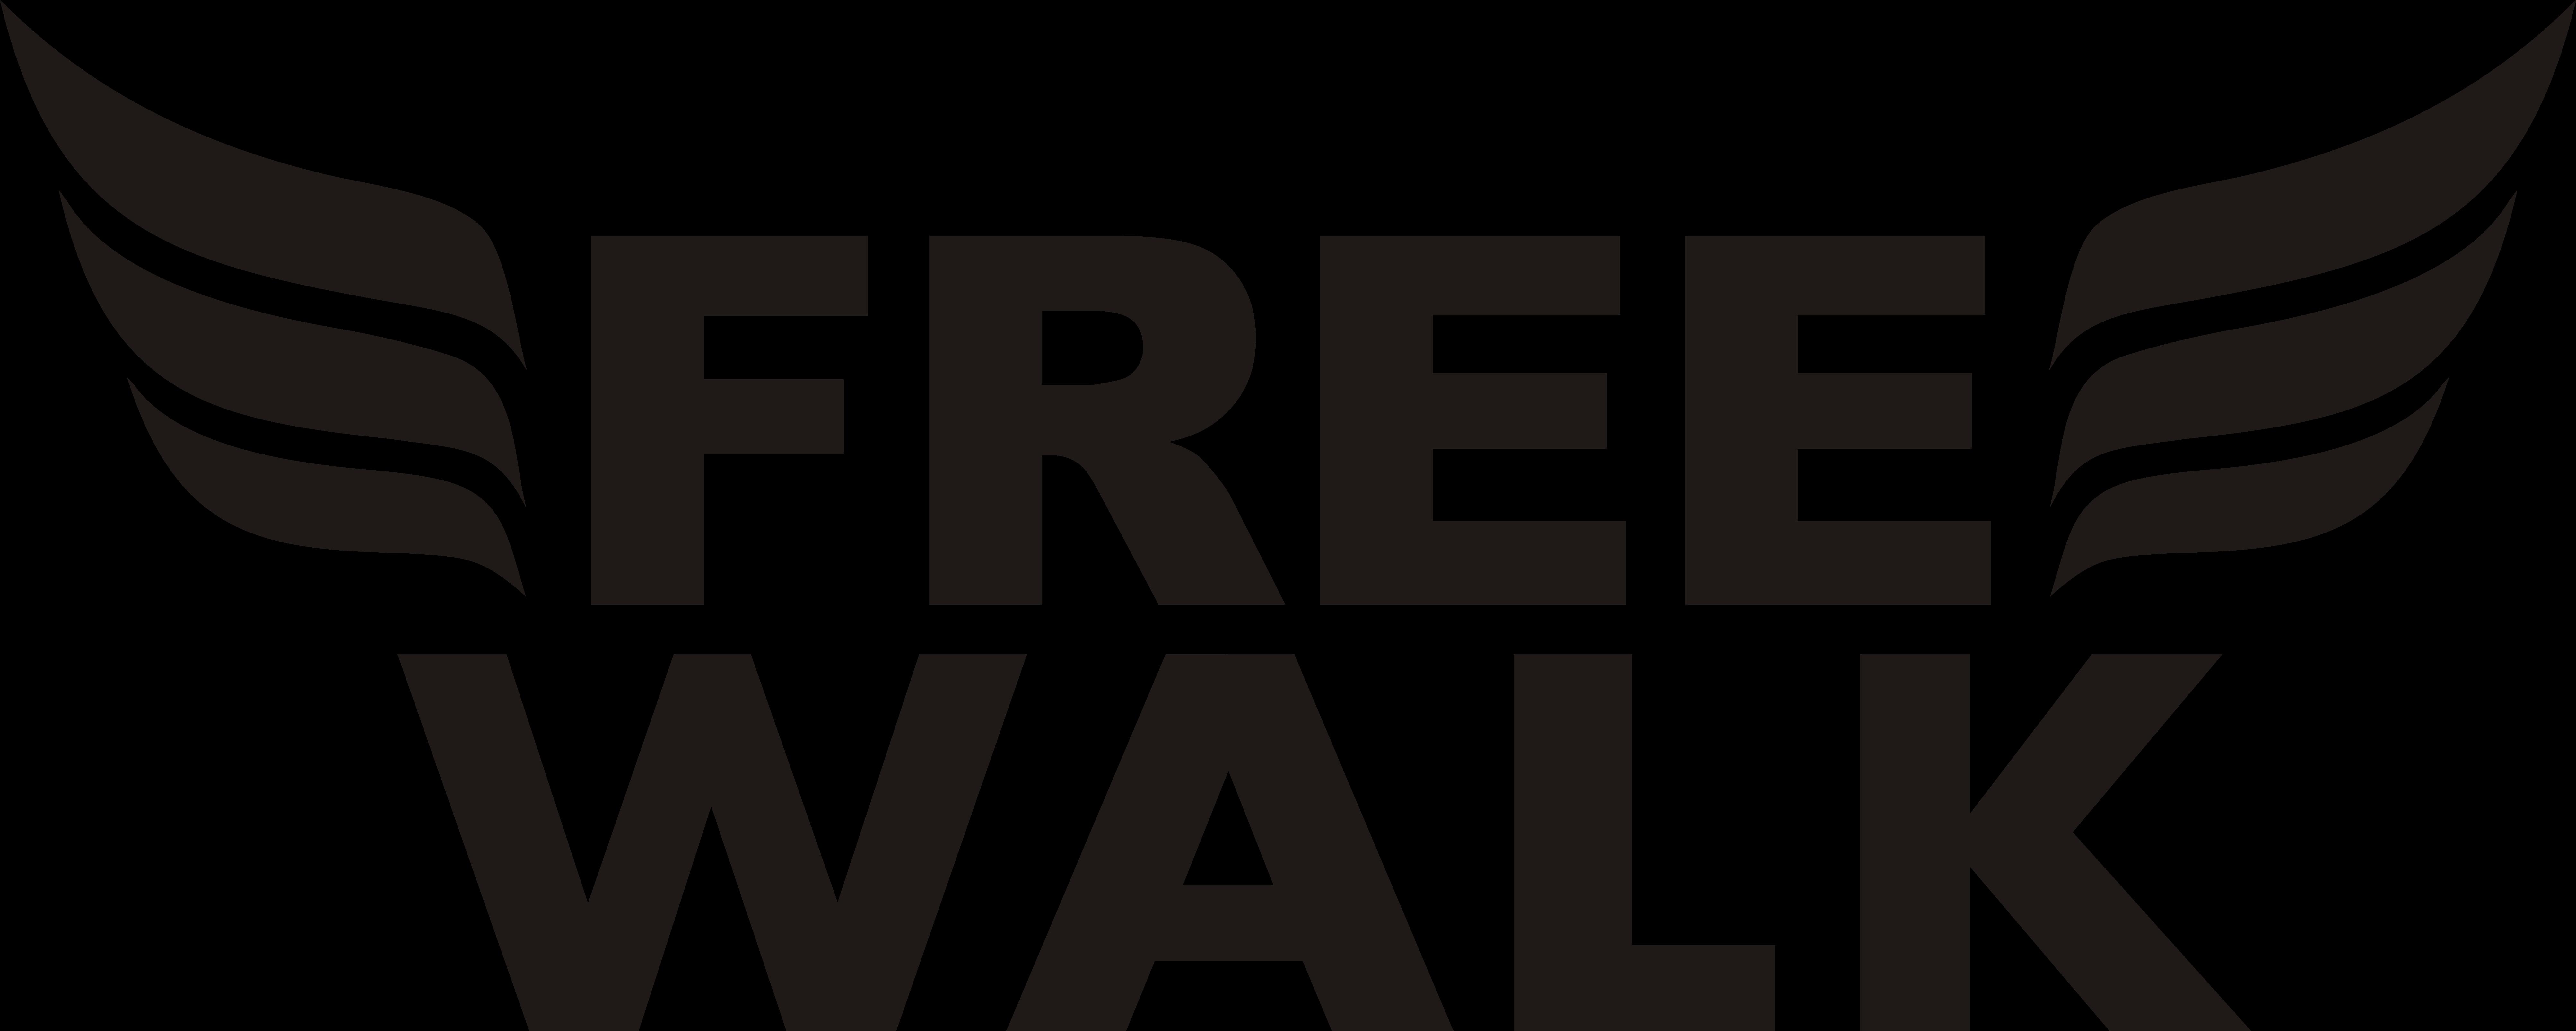 freewalk.se